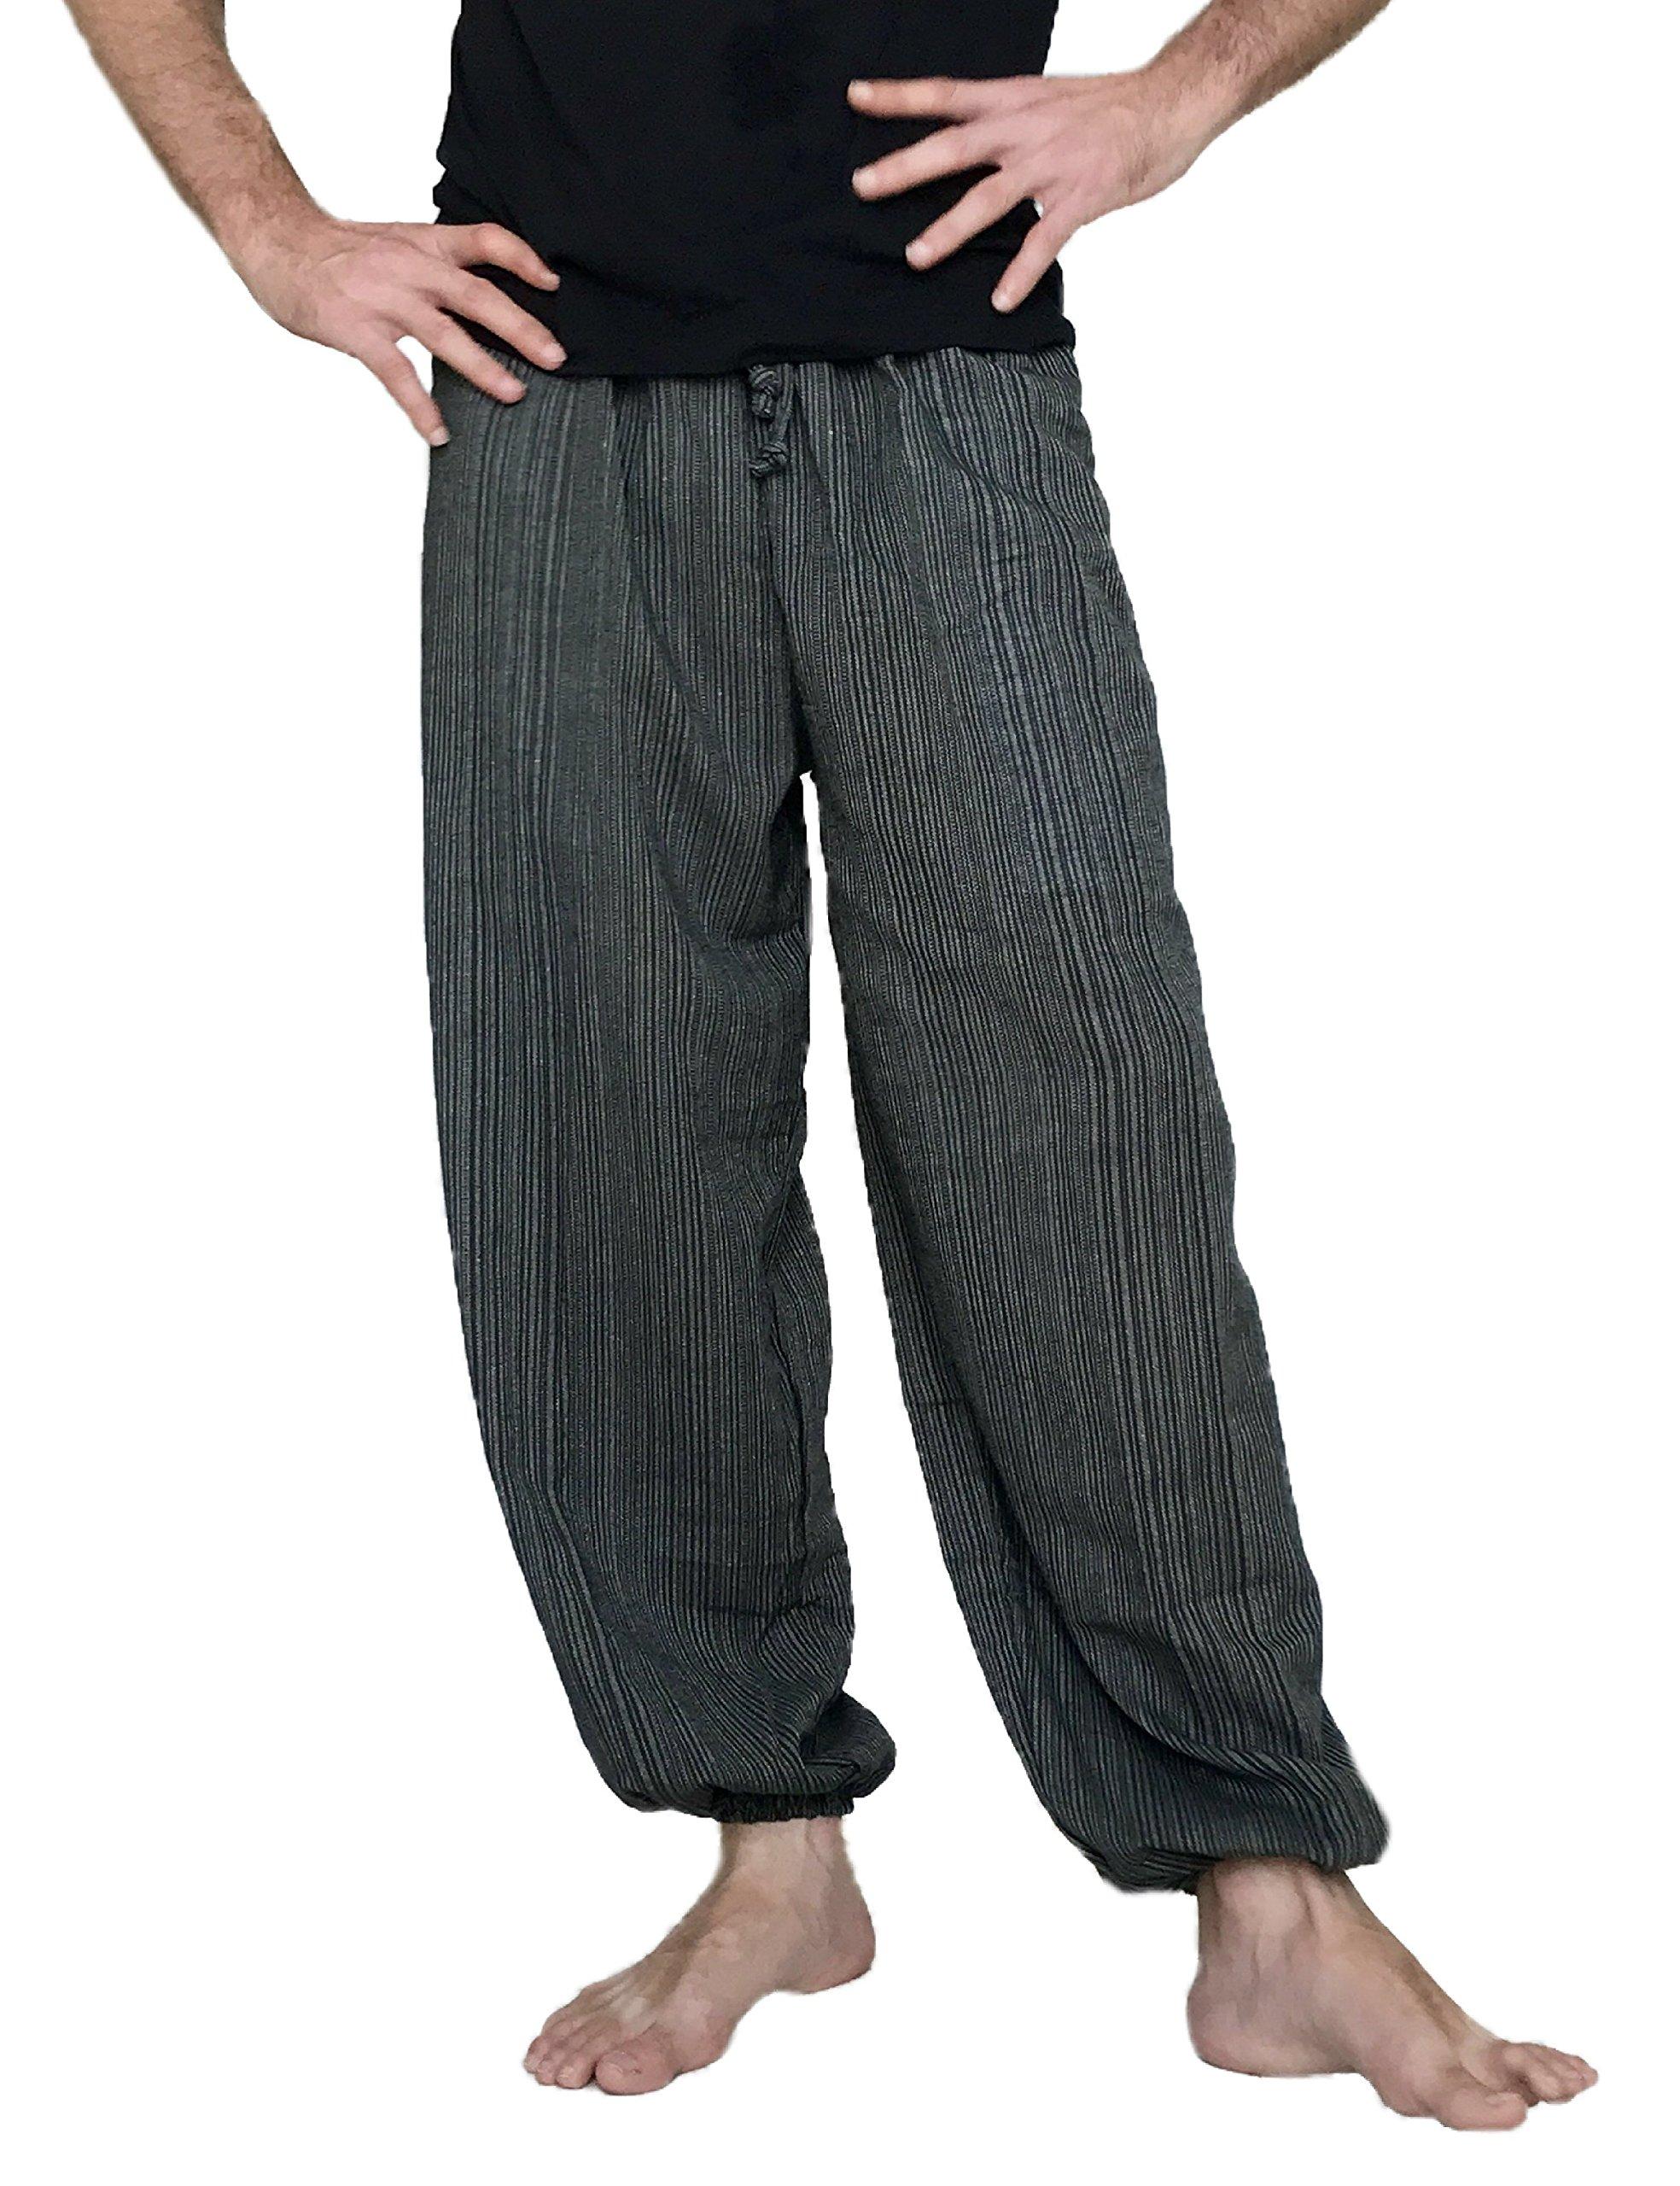 Love Quality Baggy Pants Men's One Size Cotton Harem Pants Hippie Boho Trousers (Dark Grey)